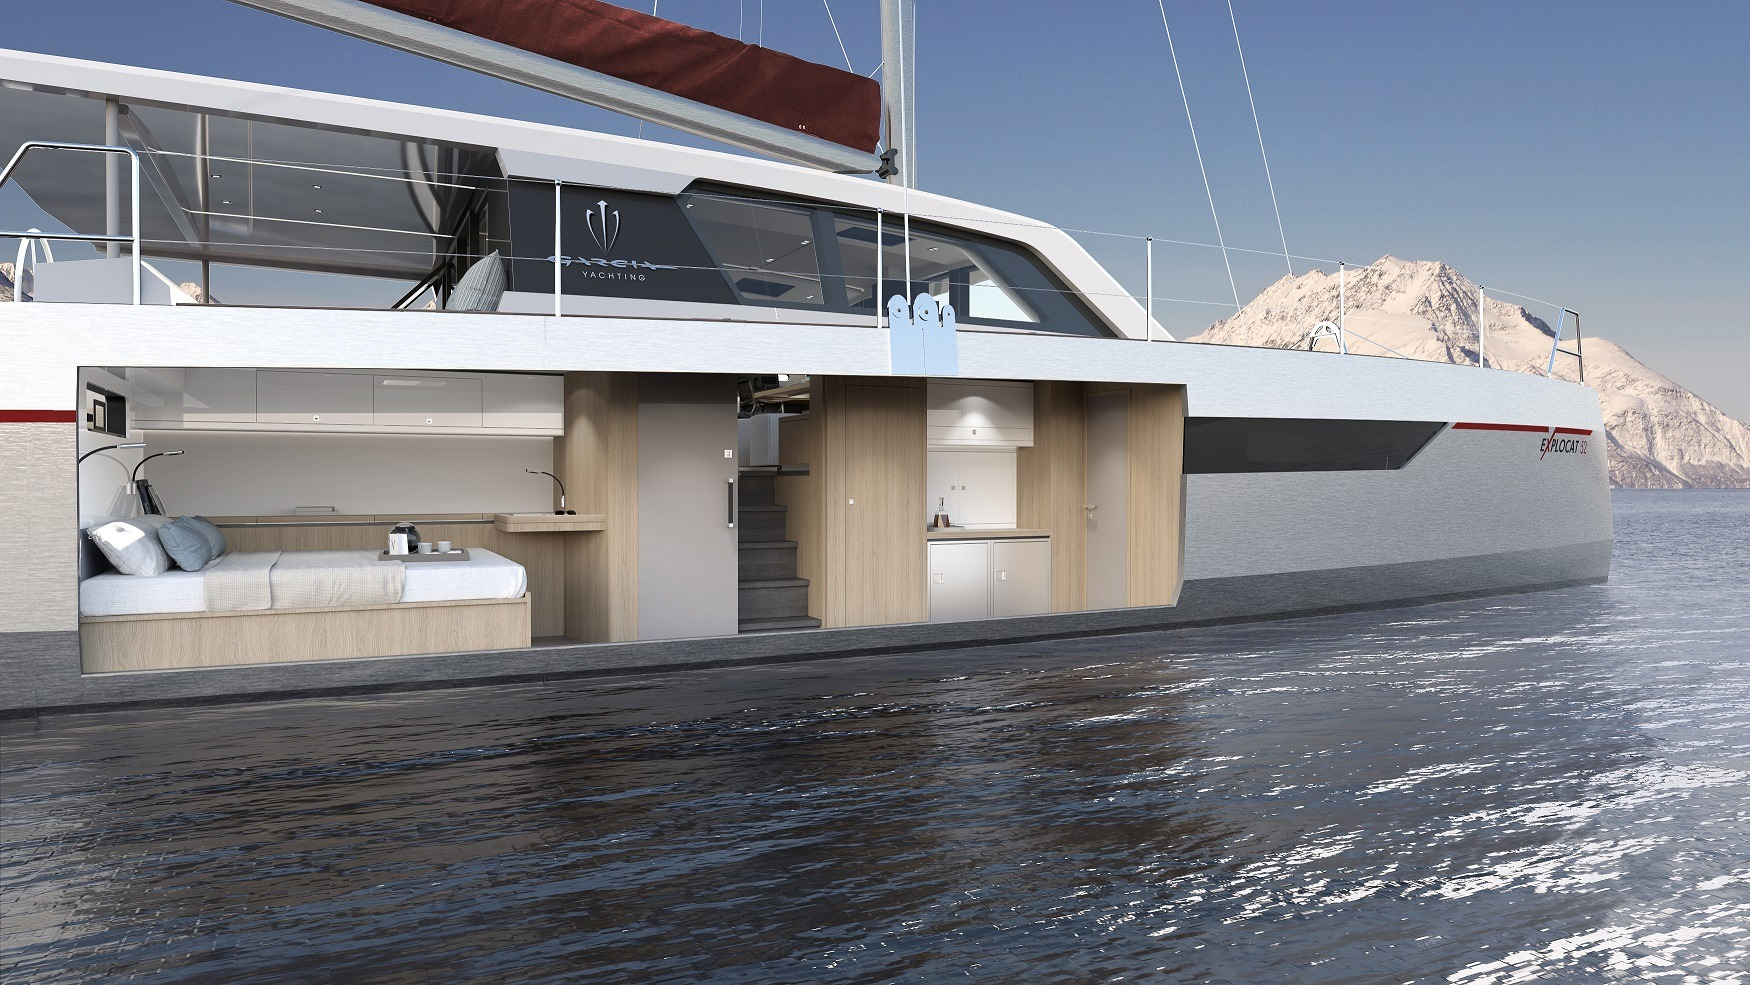 Explocat 52 - The Aluminium Exploration Catamaran - Garcia Yachts